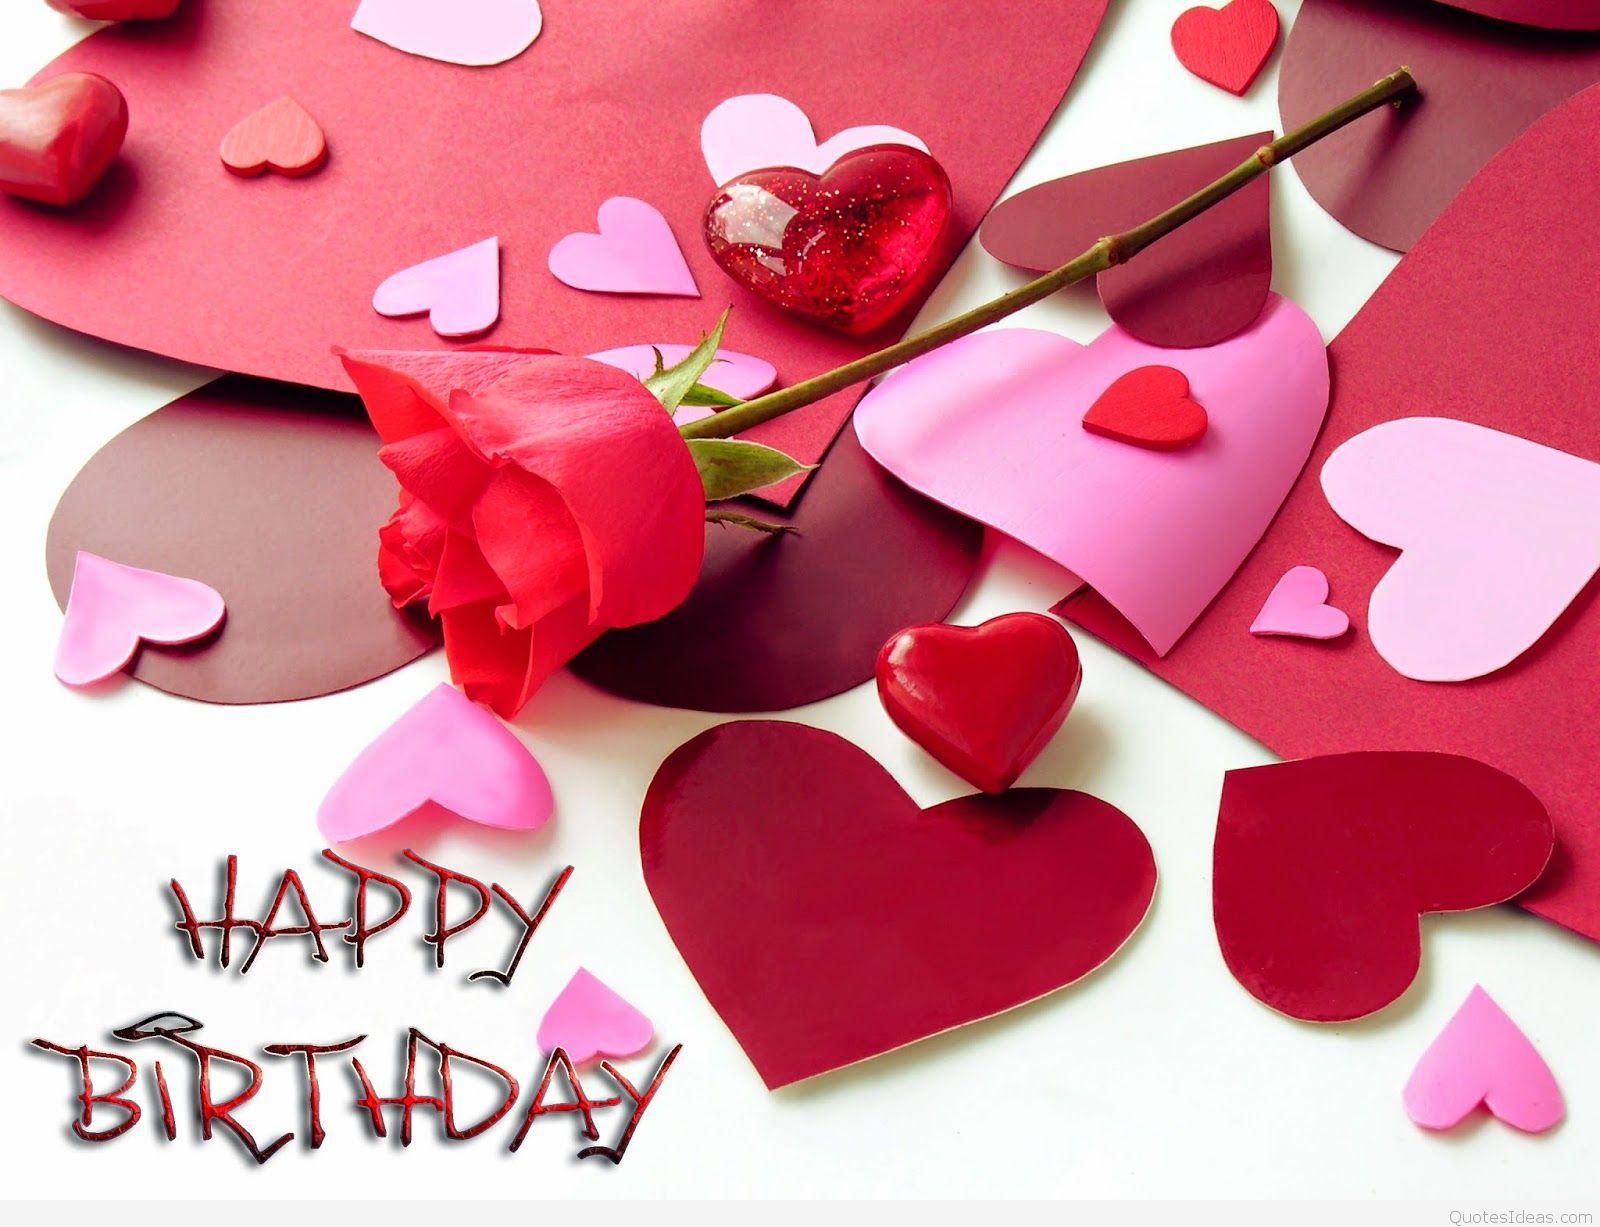 Cute Happy Birthday Wishes